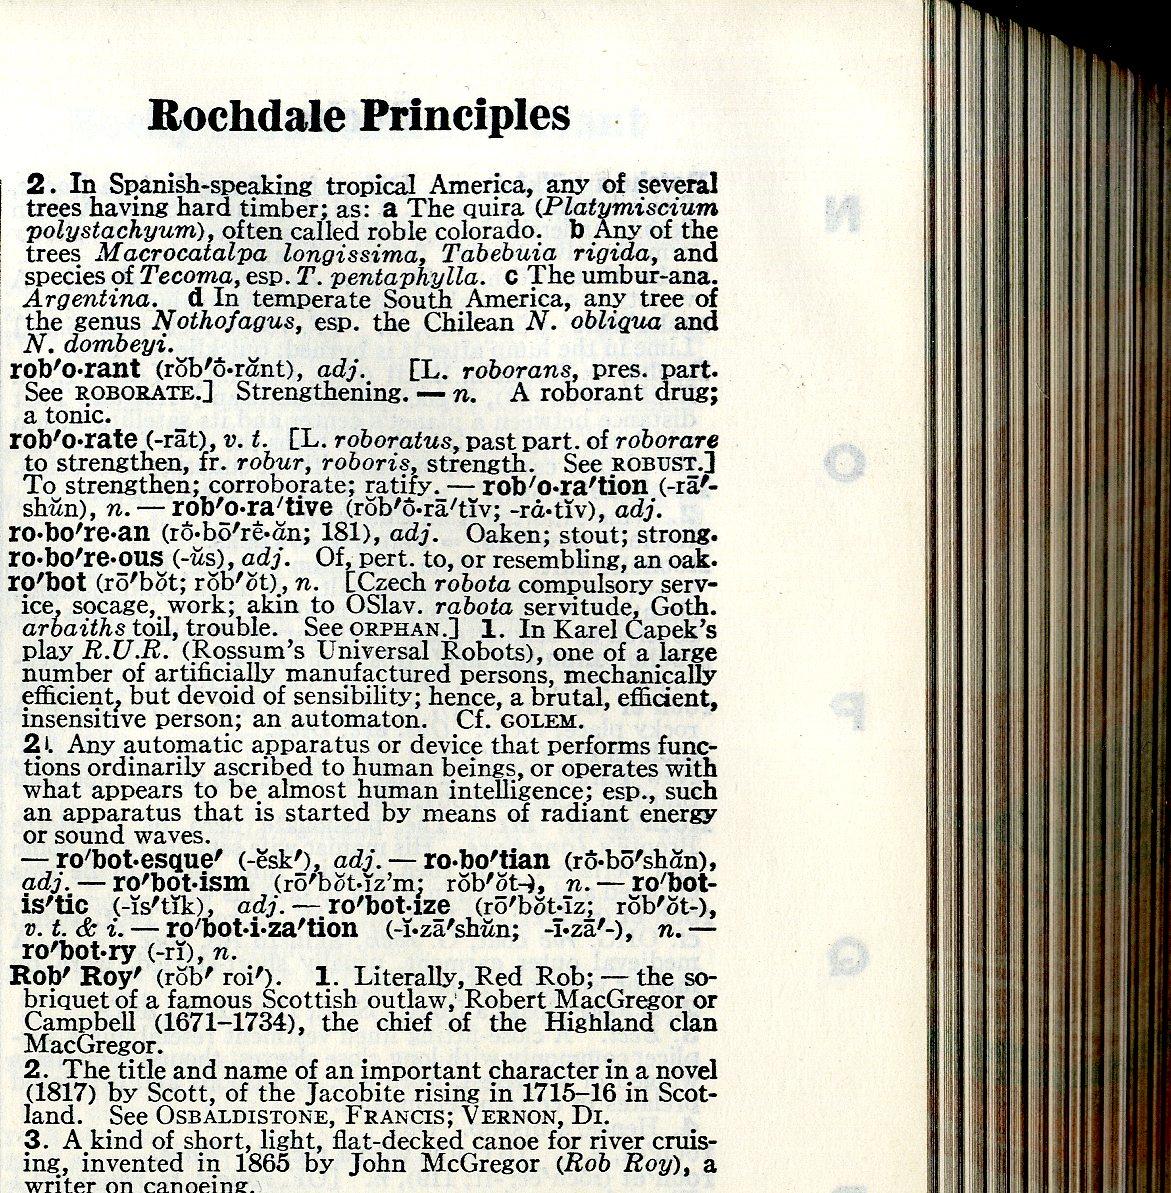 Robot definicija Webster new international dictionary second edition